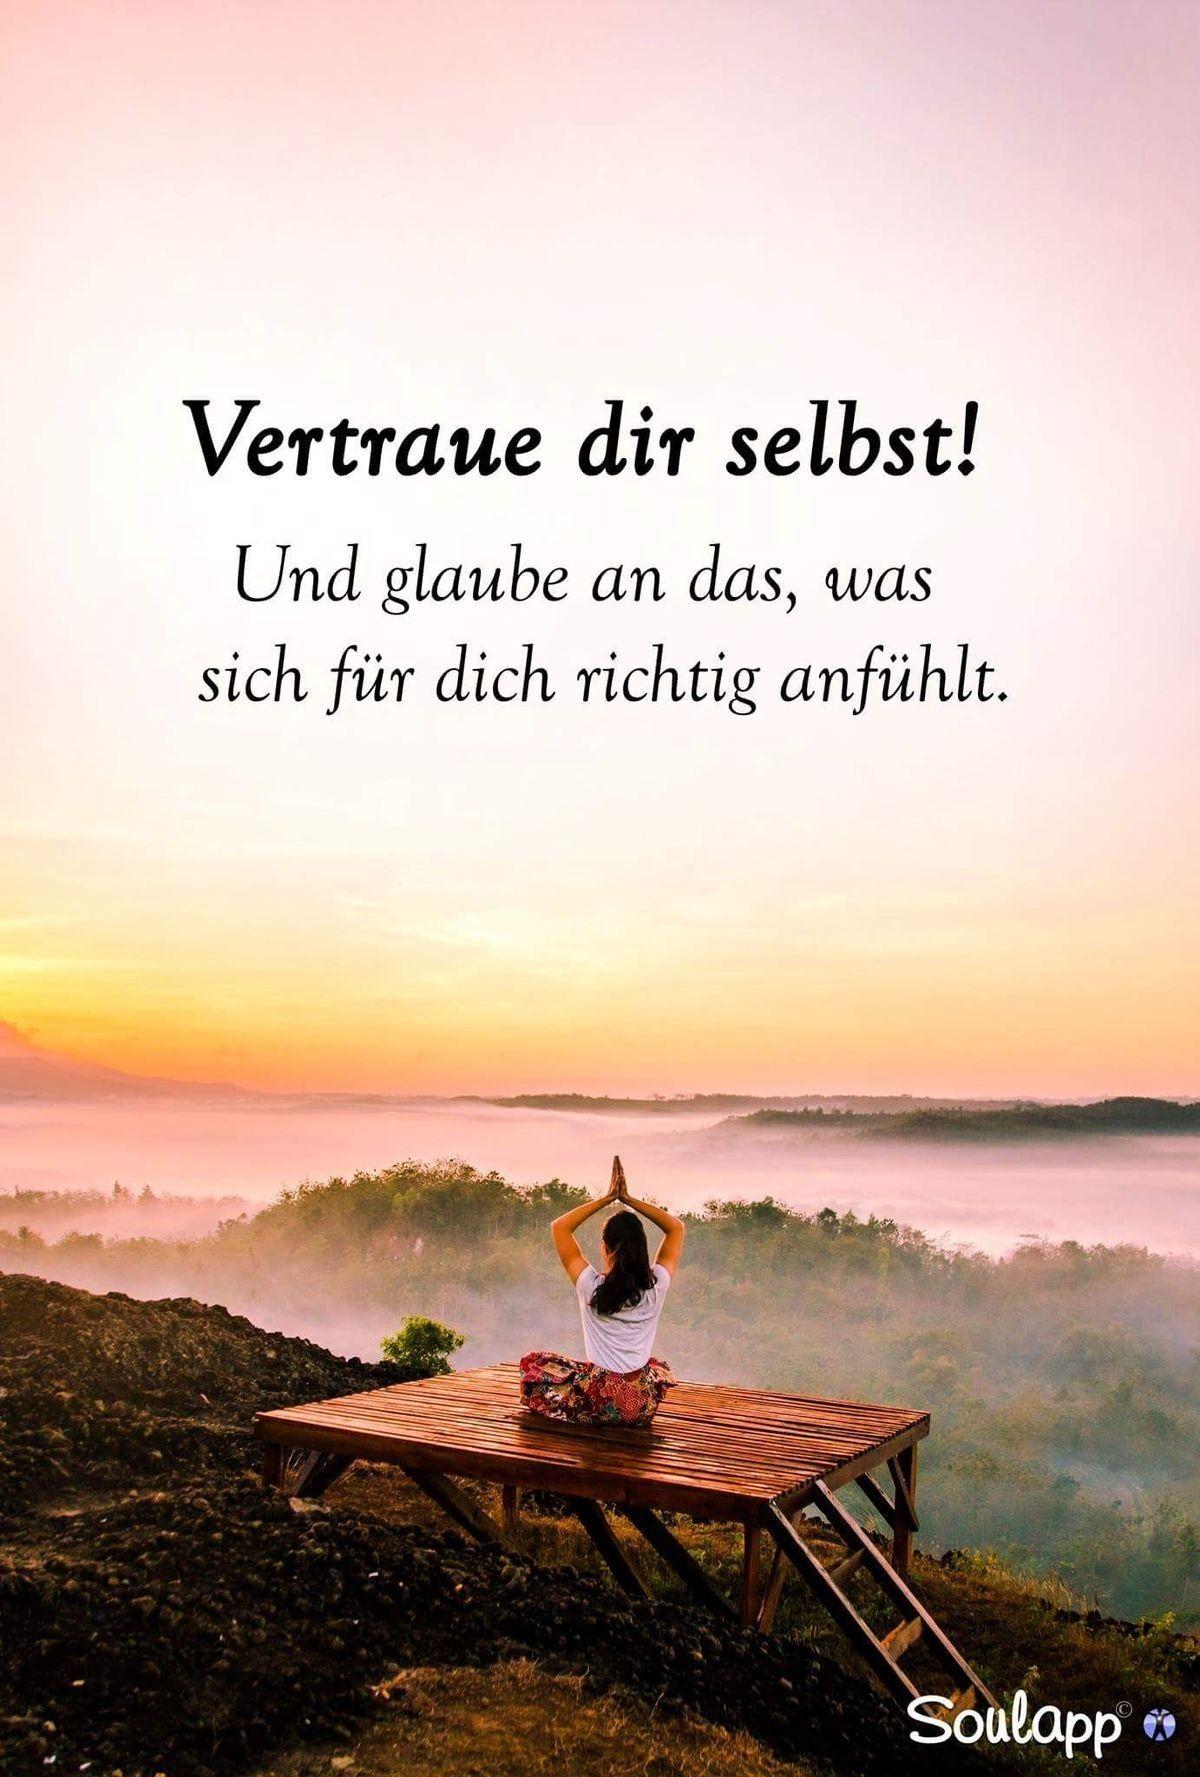 www.selbstvertrauen-fuer-frauen.de/blog ...